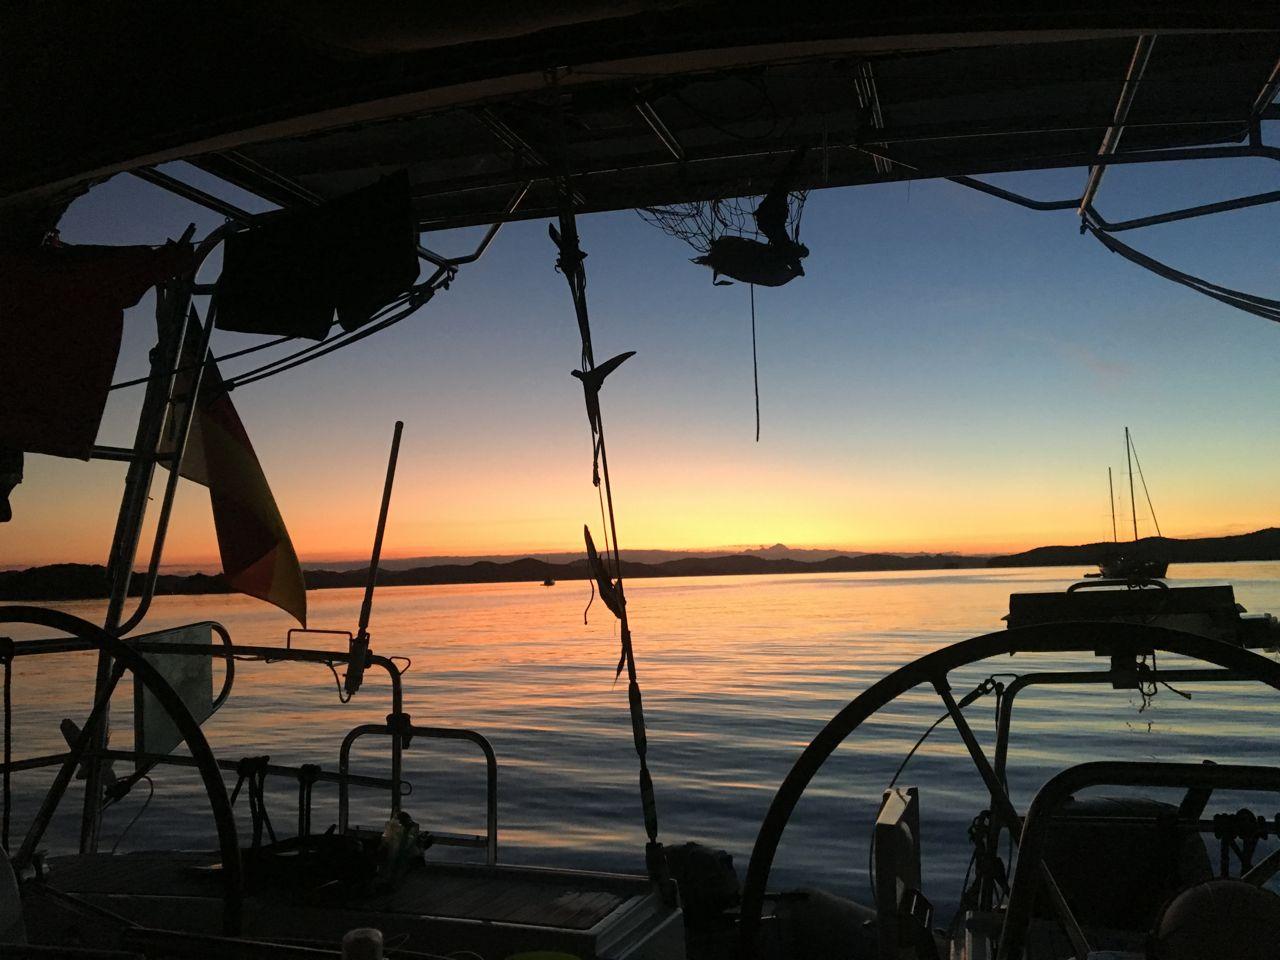 Sonnenuntergang in der Paradise Bay von Urupukapuka